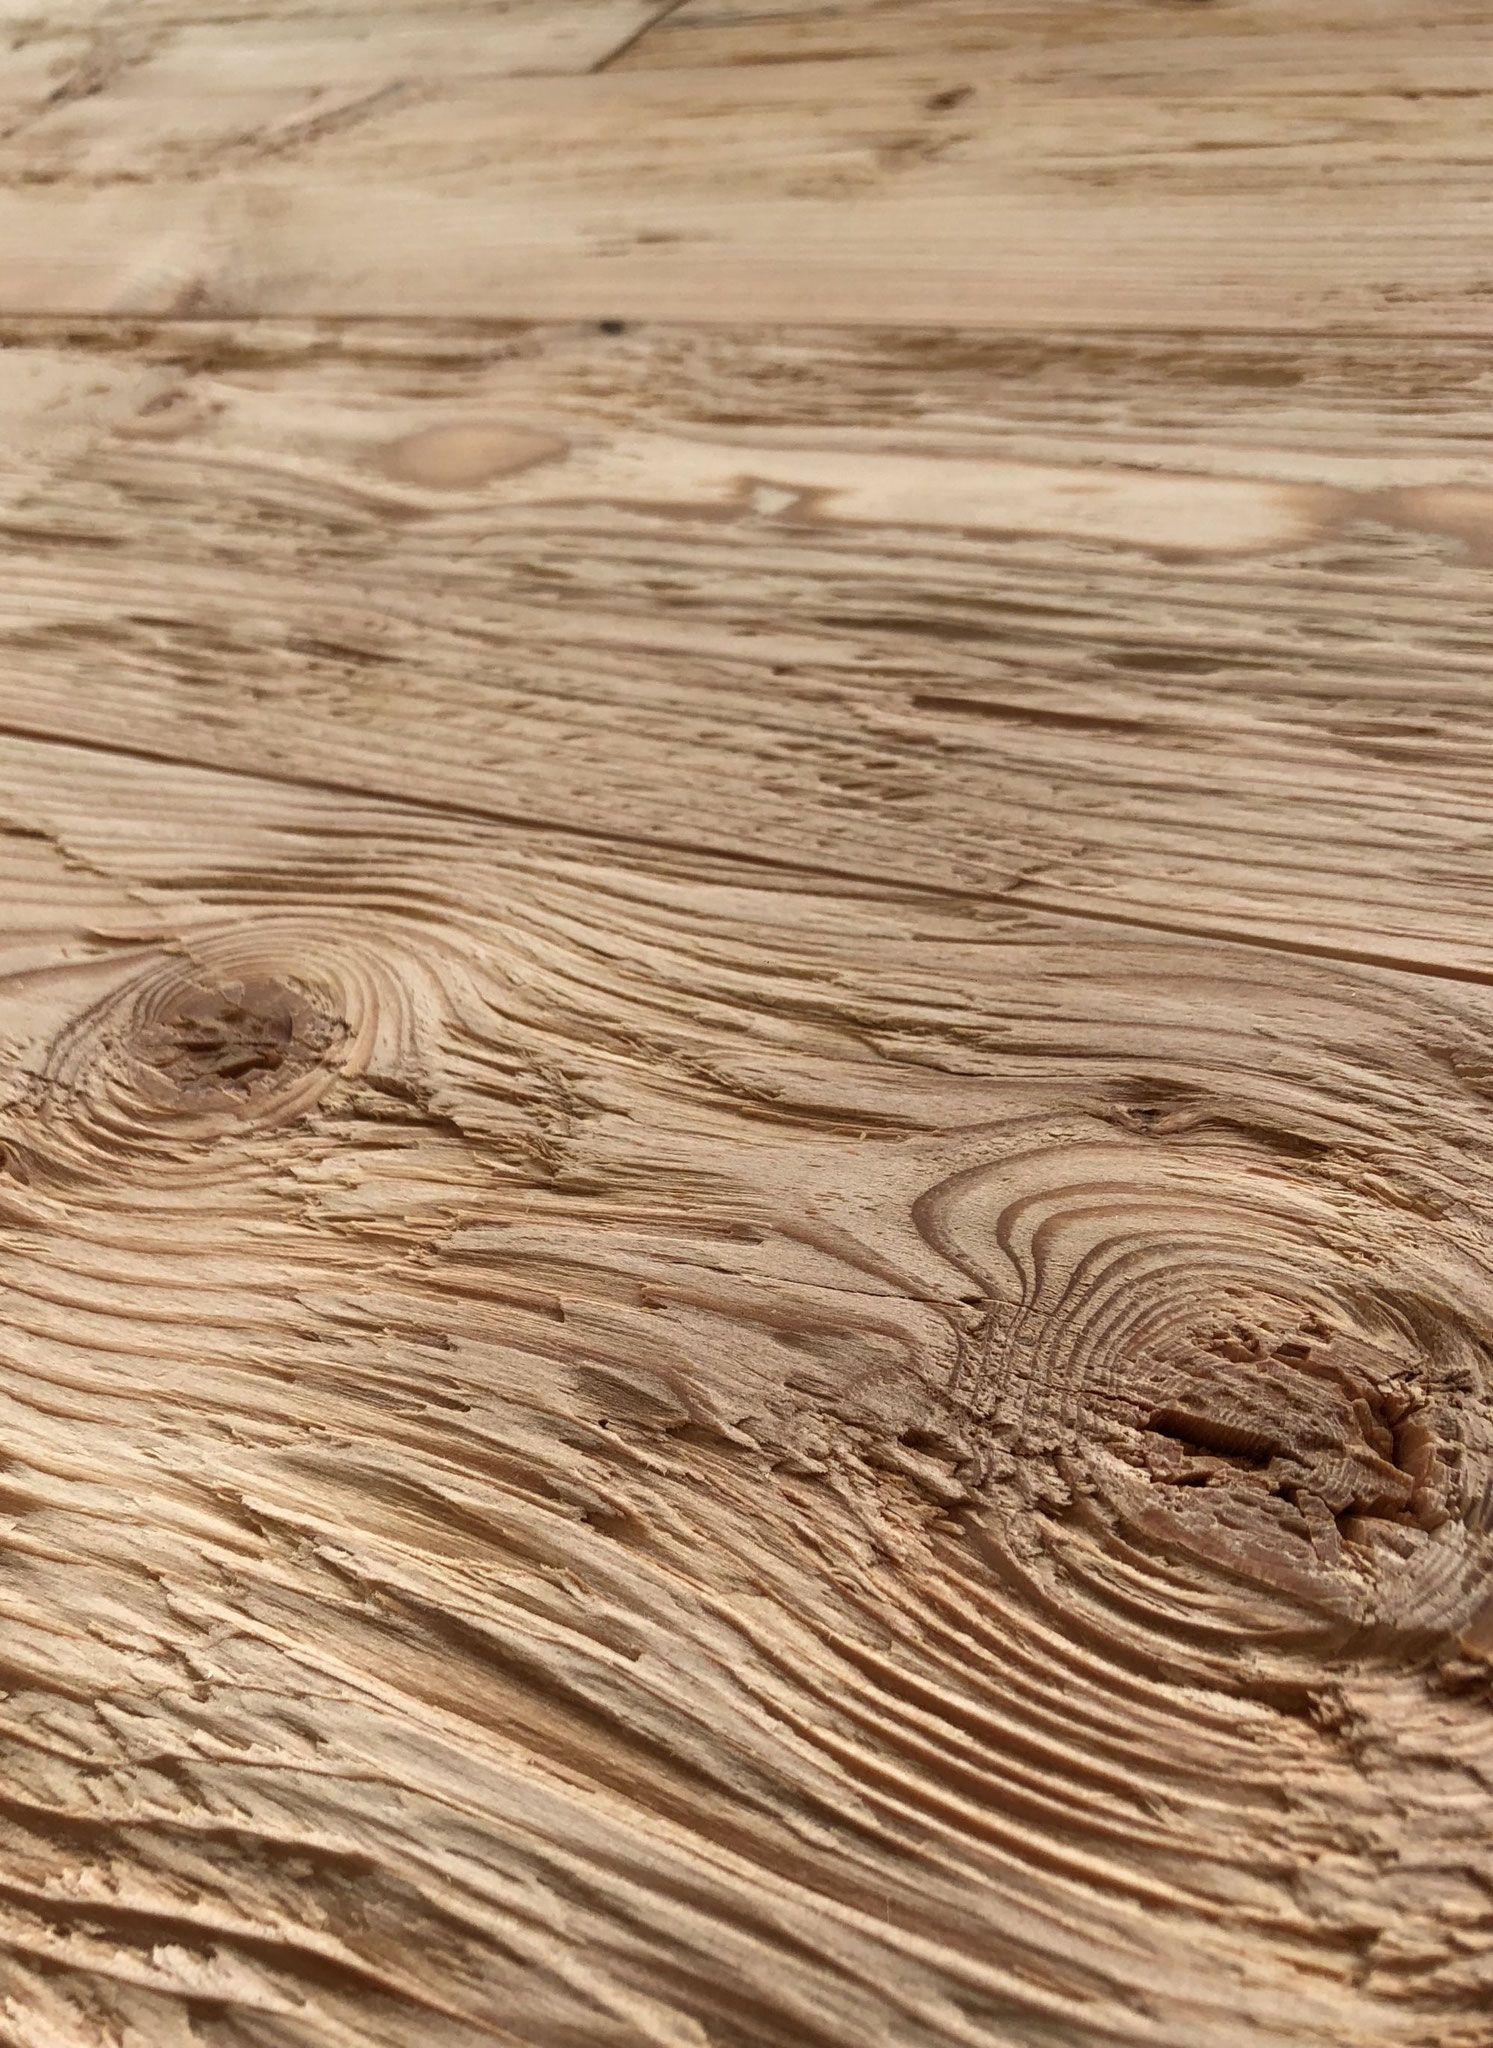 Fichte Natur Vintage Holz Altholz Wandverkleidung Deckenverkleidung Und Wandverkleidung